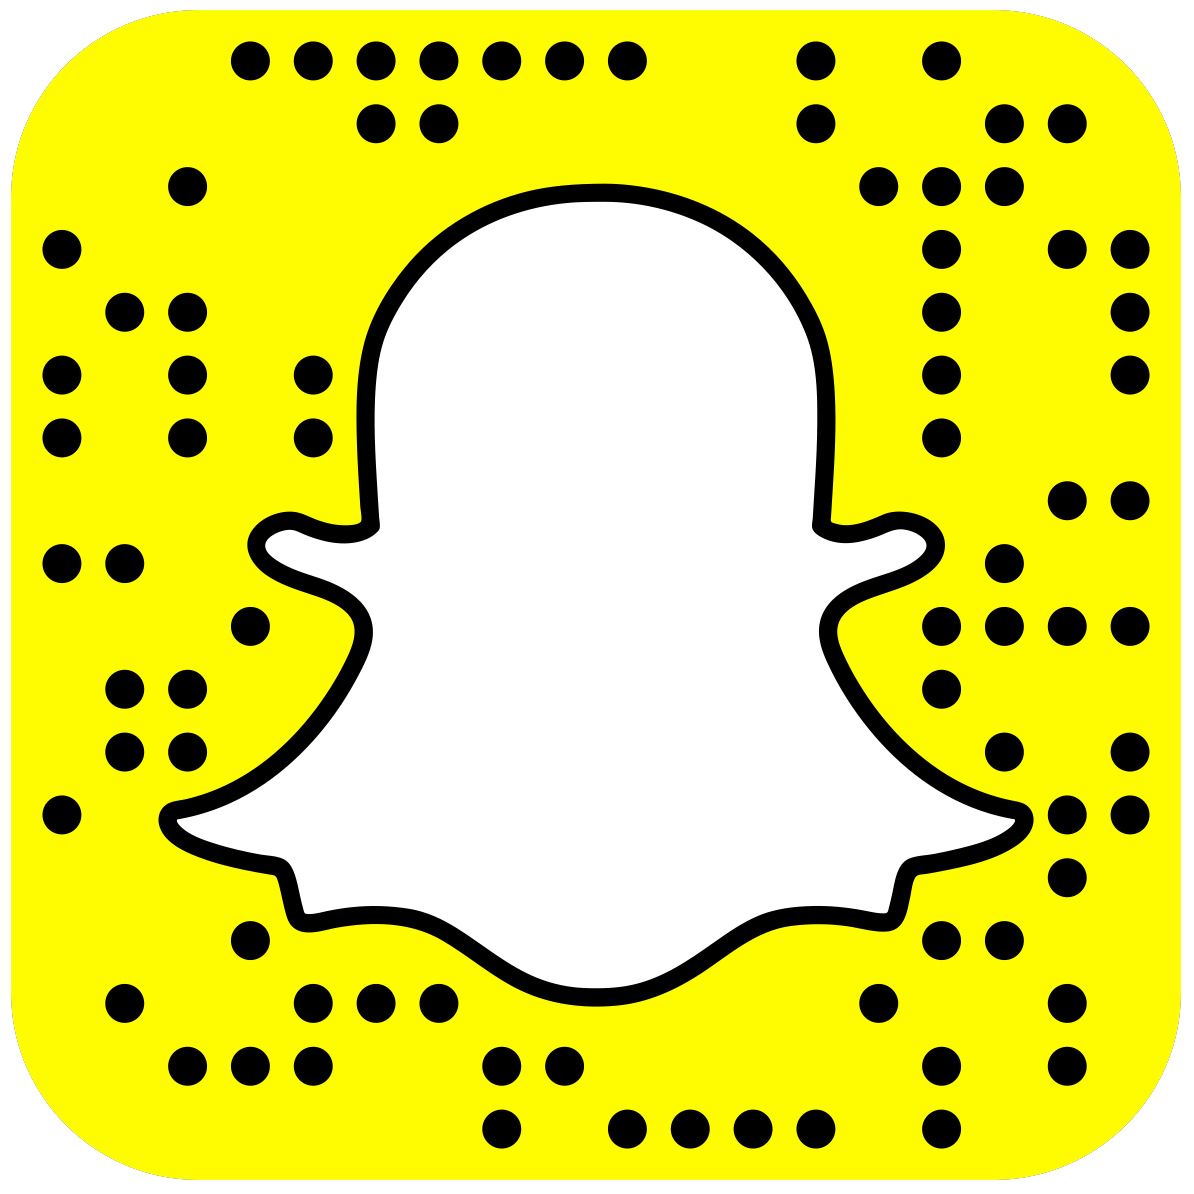 Maddie Ziegler Snapchat username